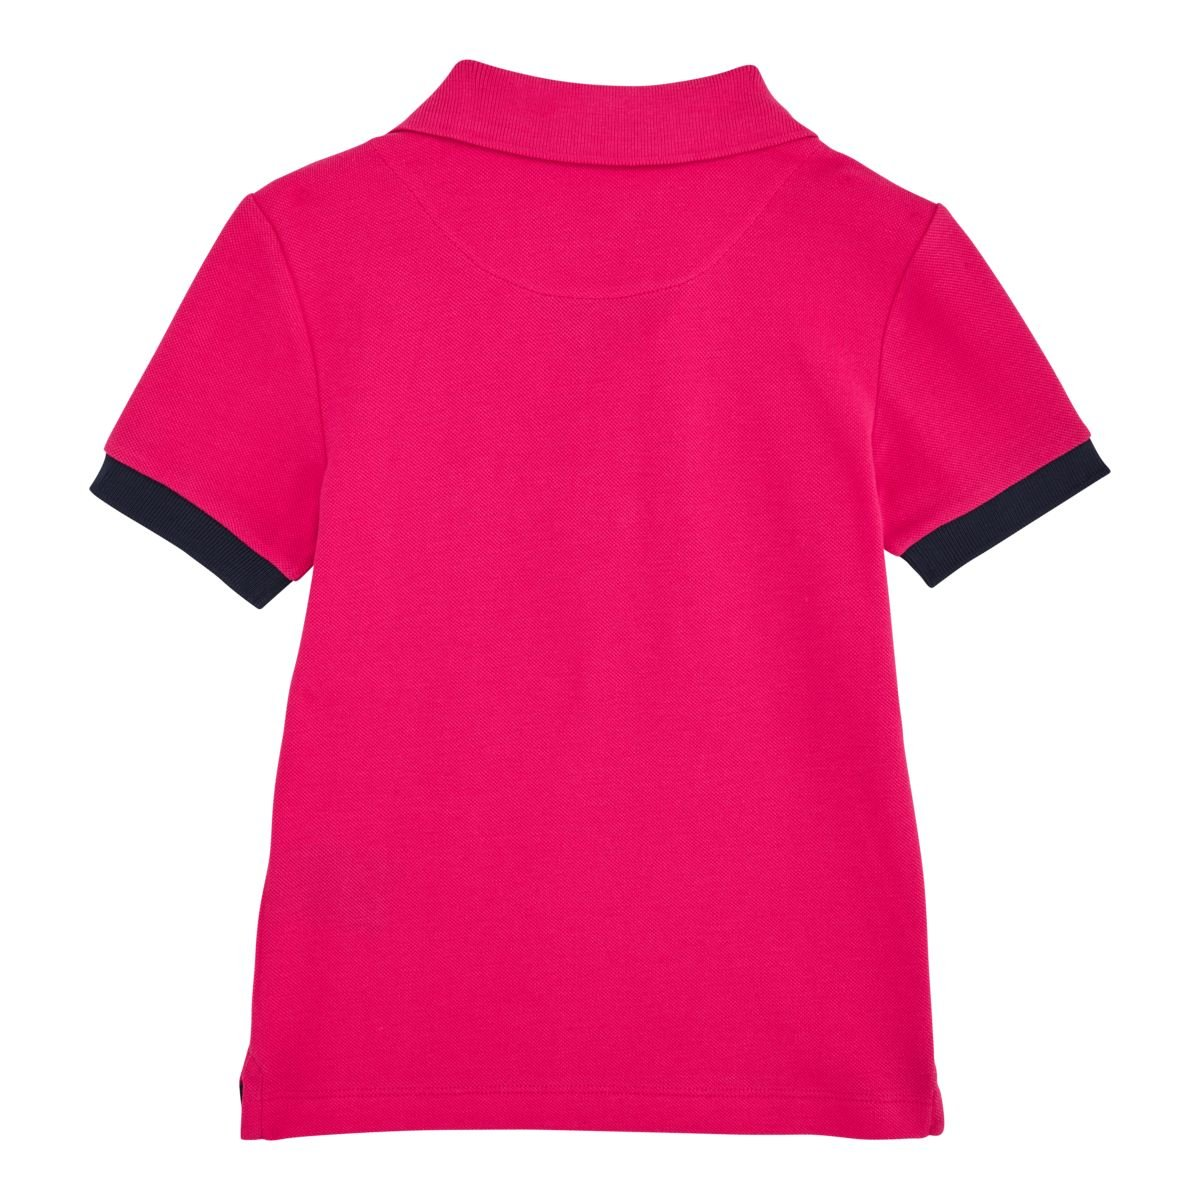 Vilebrequin Boys Cotton Pique Polo Shirts Solid